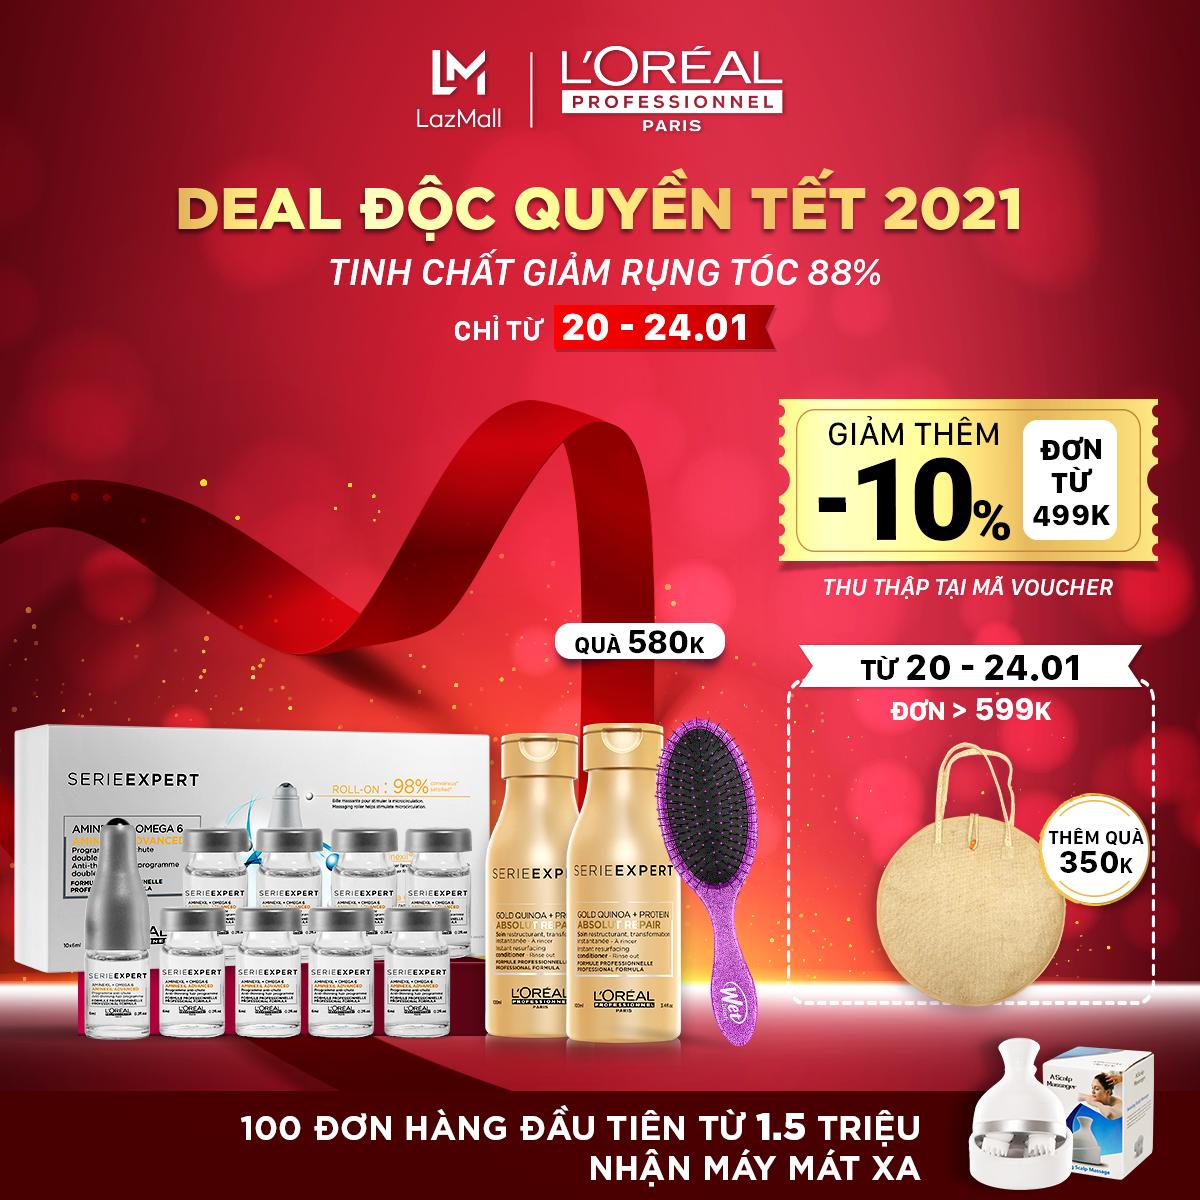 Tinh chất giảm rụng tóc L'Oreal Professionnel Aminexil Advanced L'Oréal 10x6ml